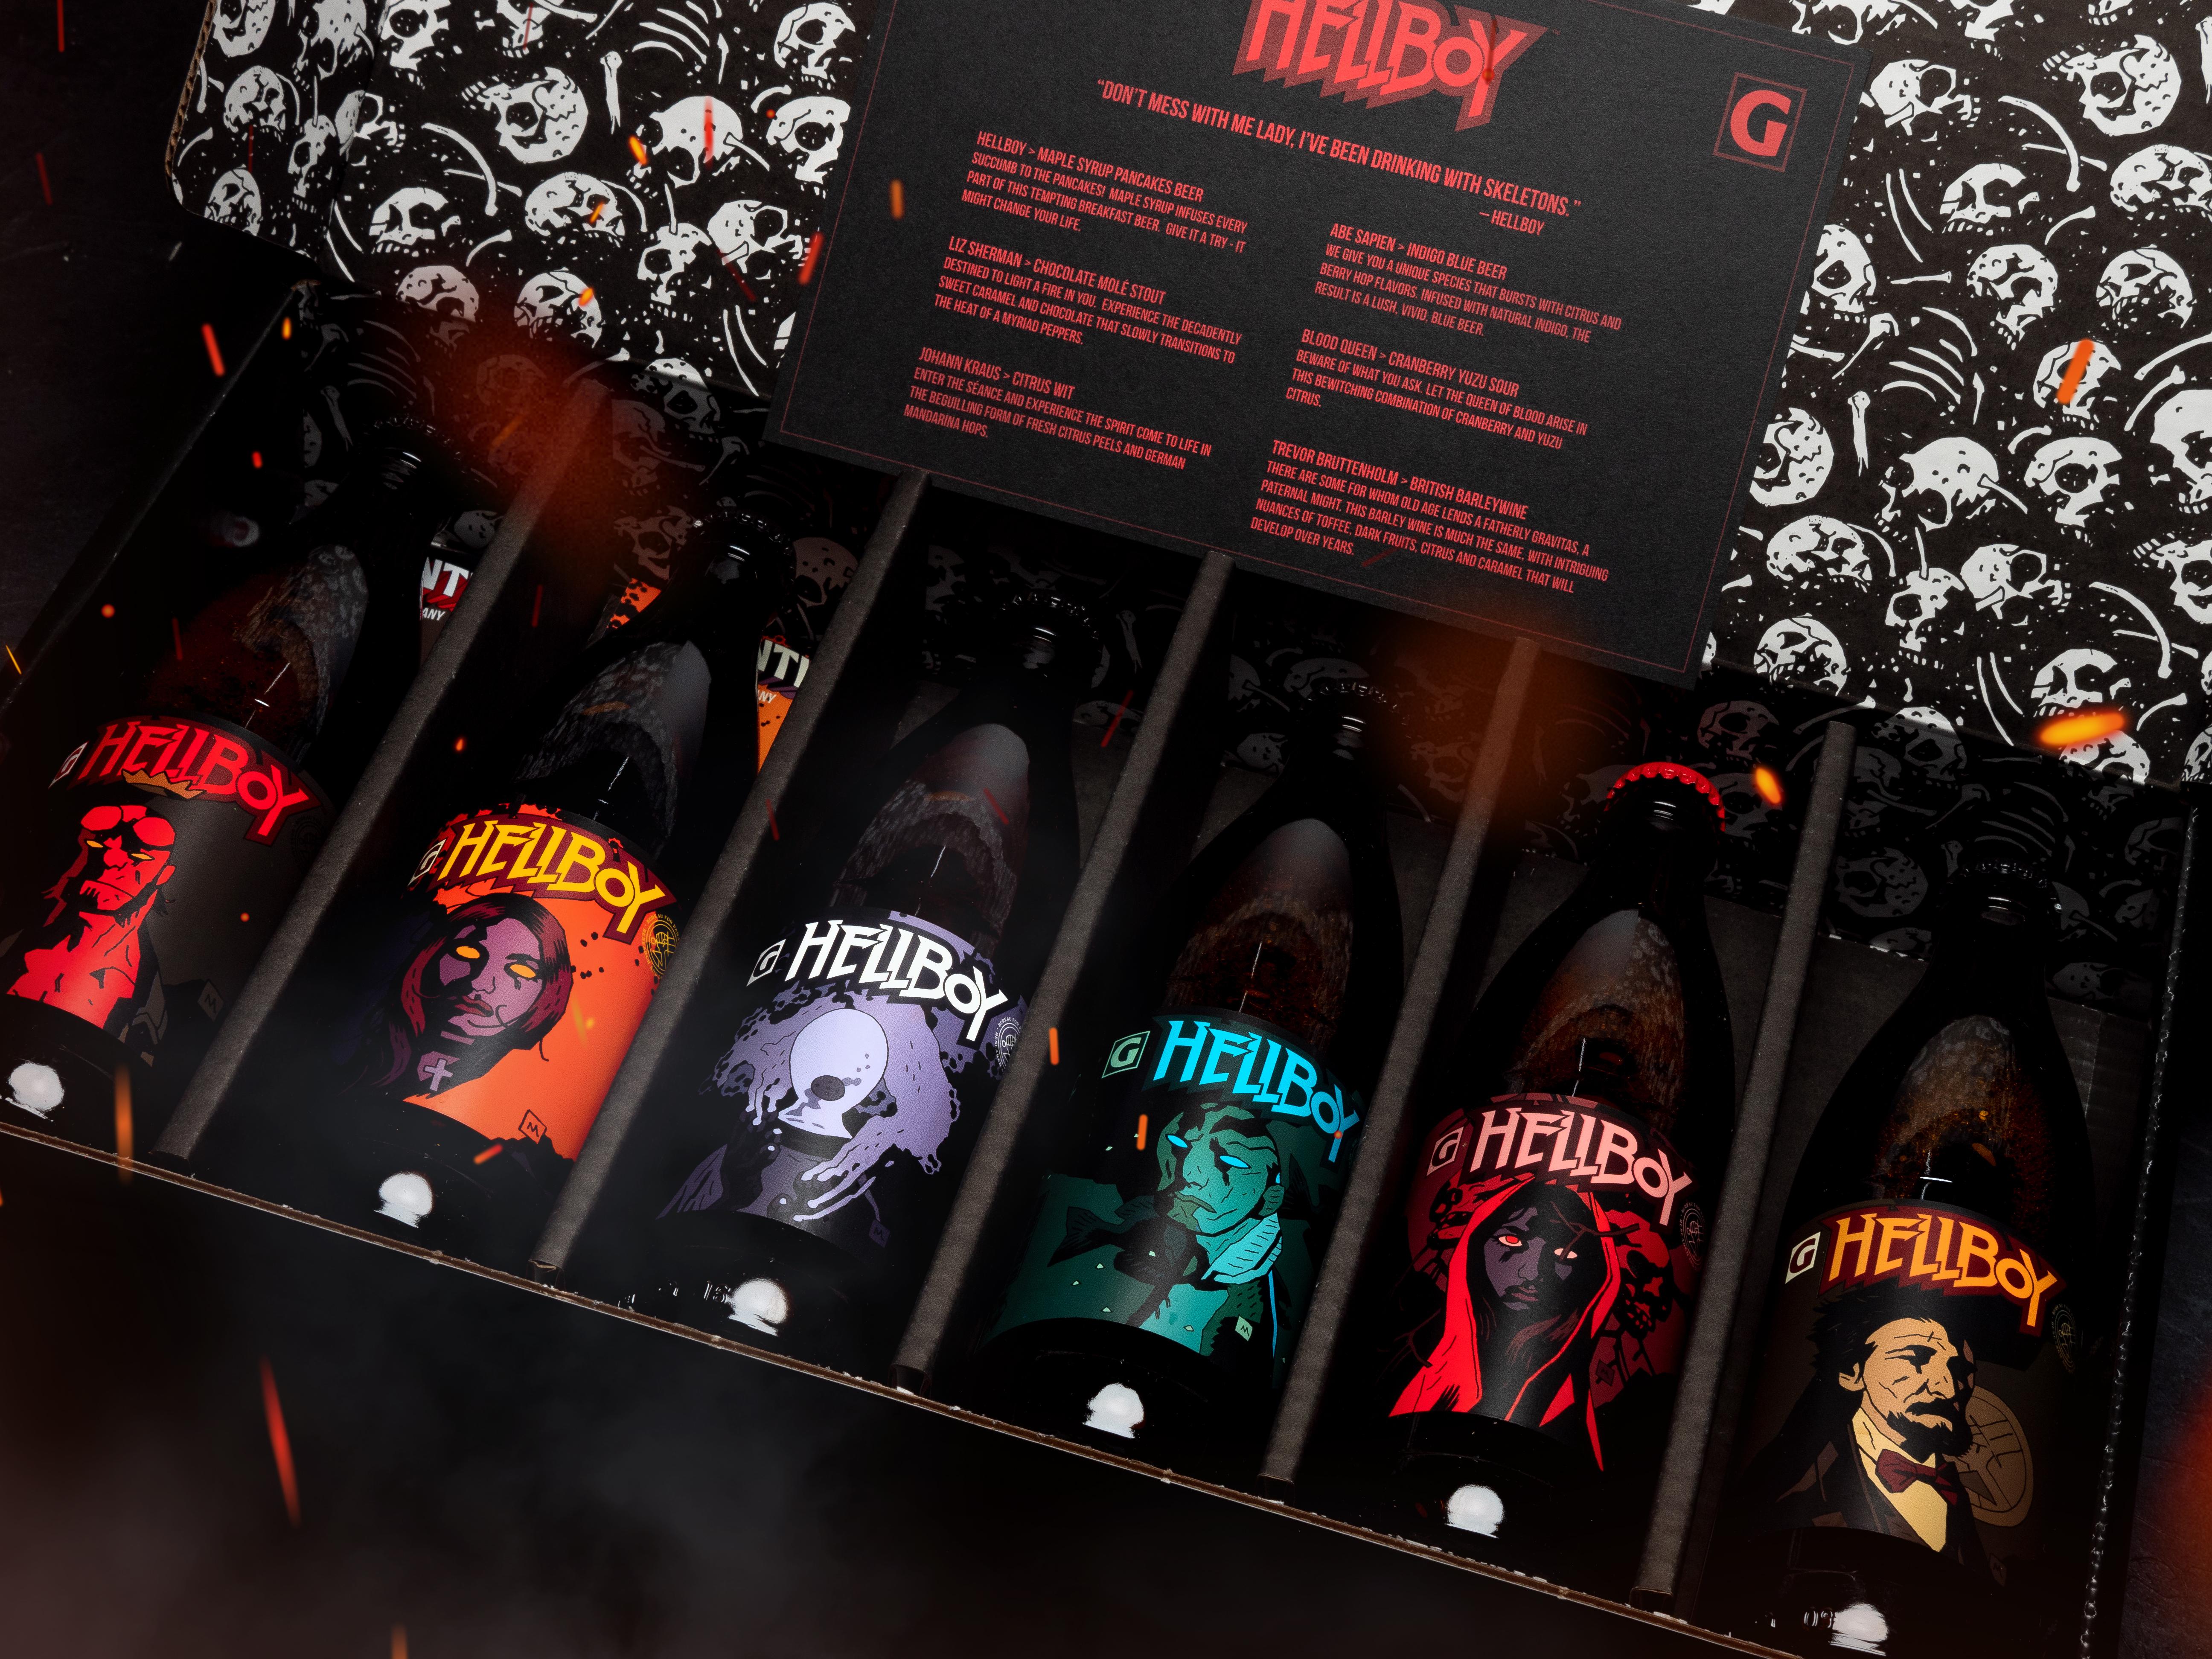 image of Hellboy Beer Box Set courtesy of Gigantic Brewing